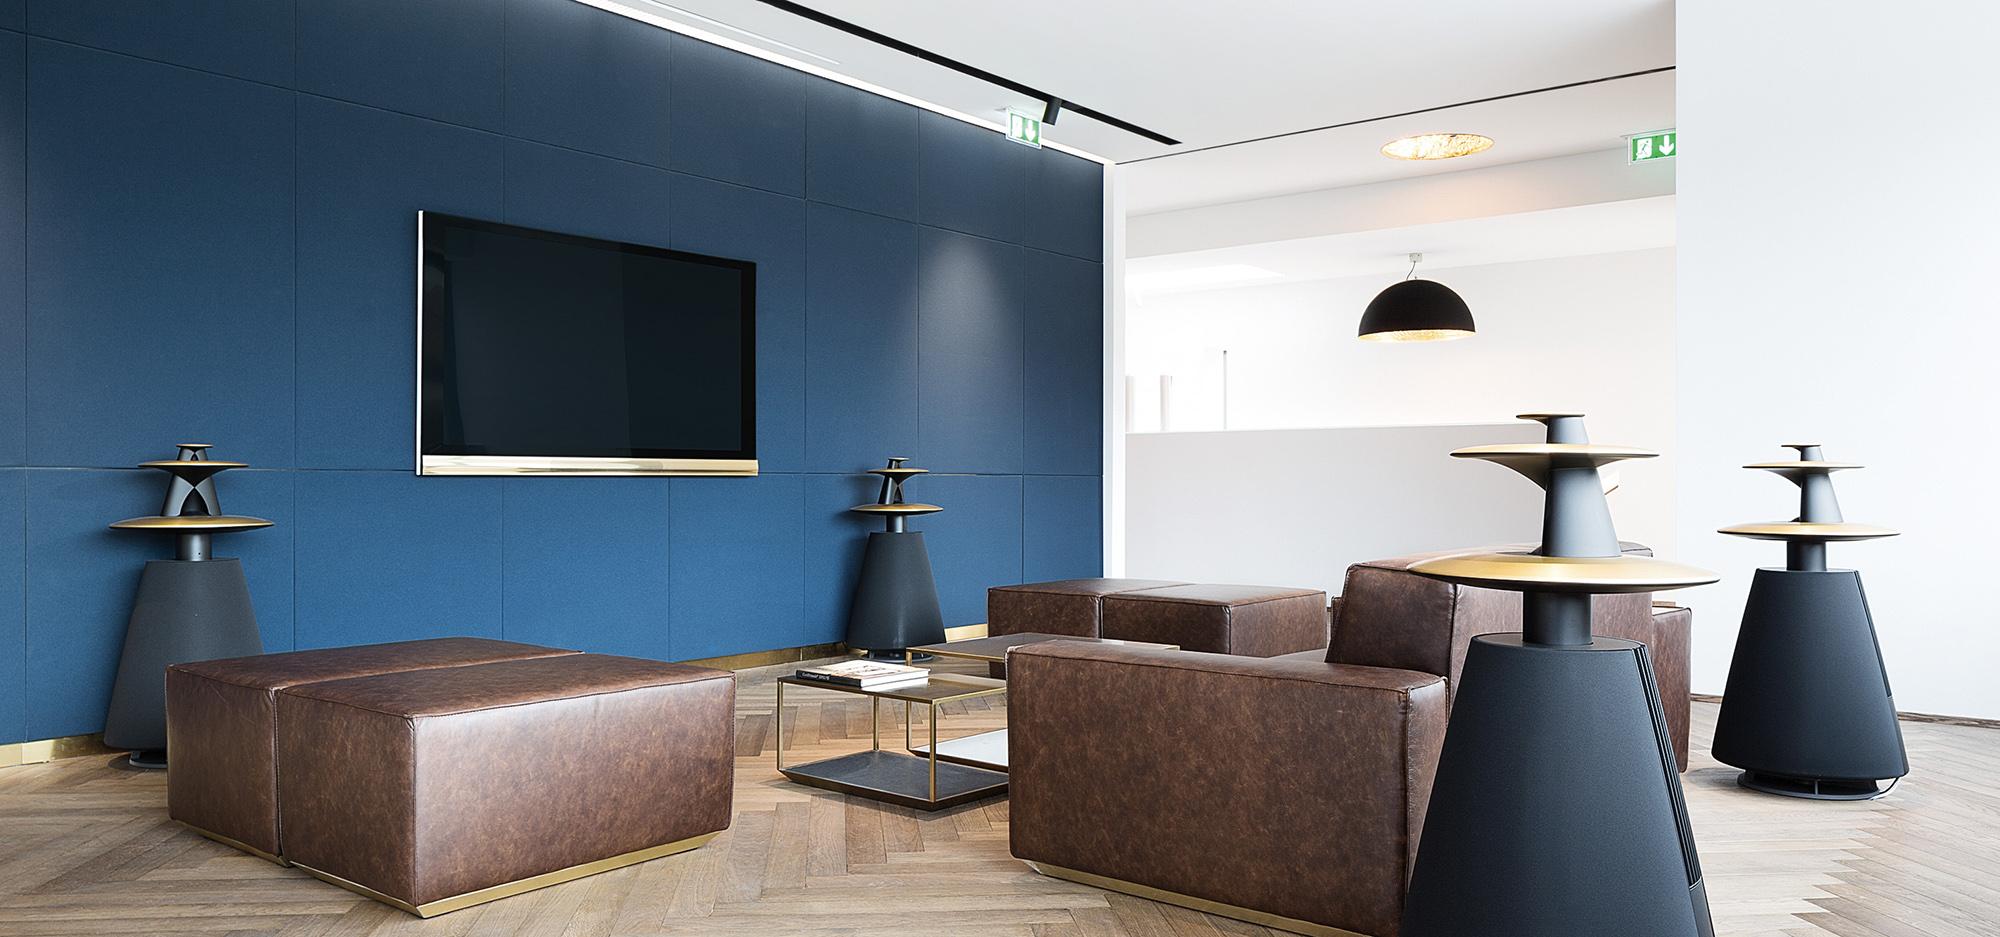 Retail design of B&O store with custom-designed furniture